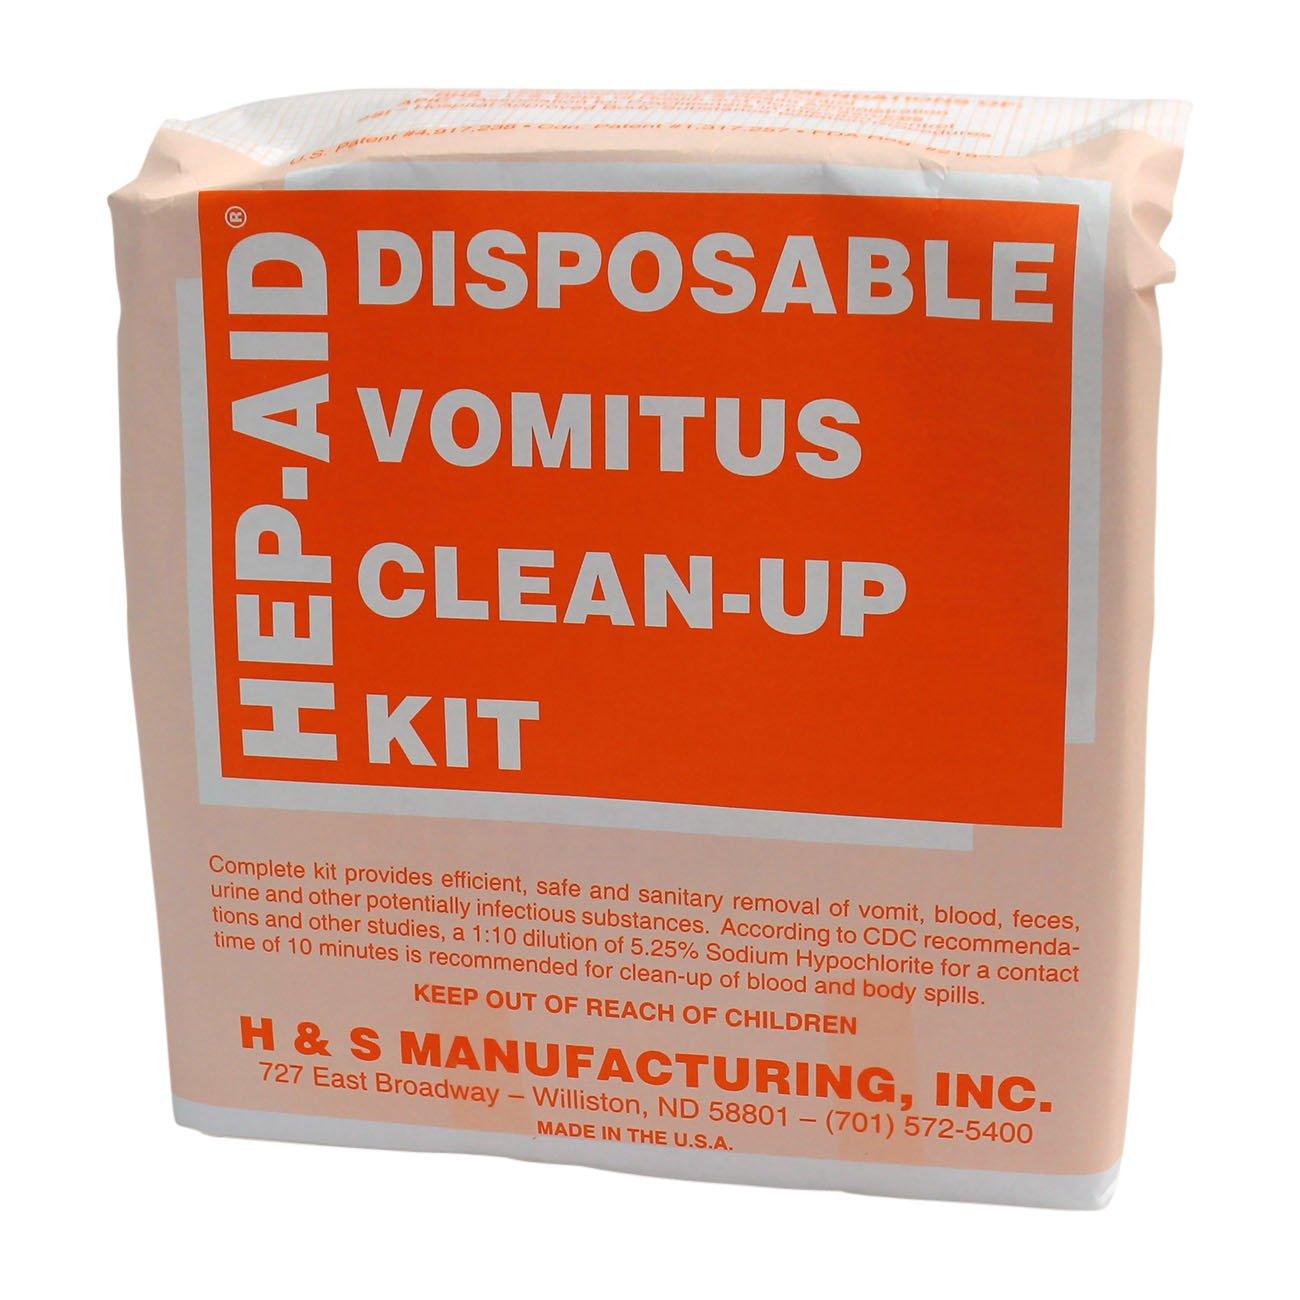 H&S Manufacturing 2575 Hep-Aid Disposable Vomitus Clean Up Kit